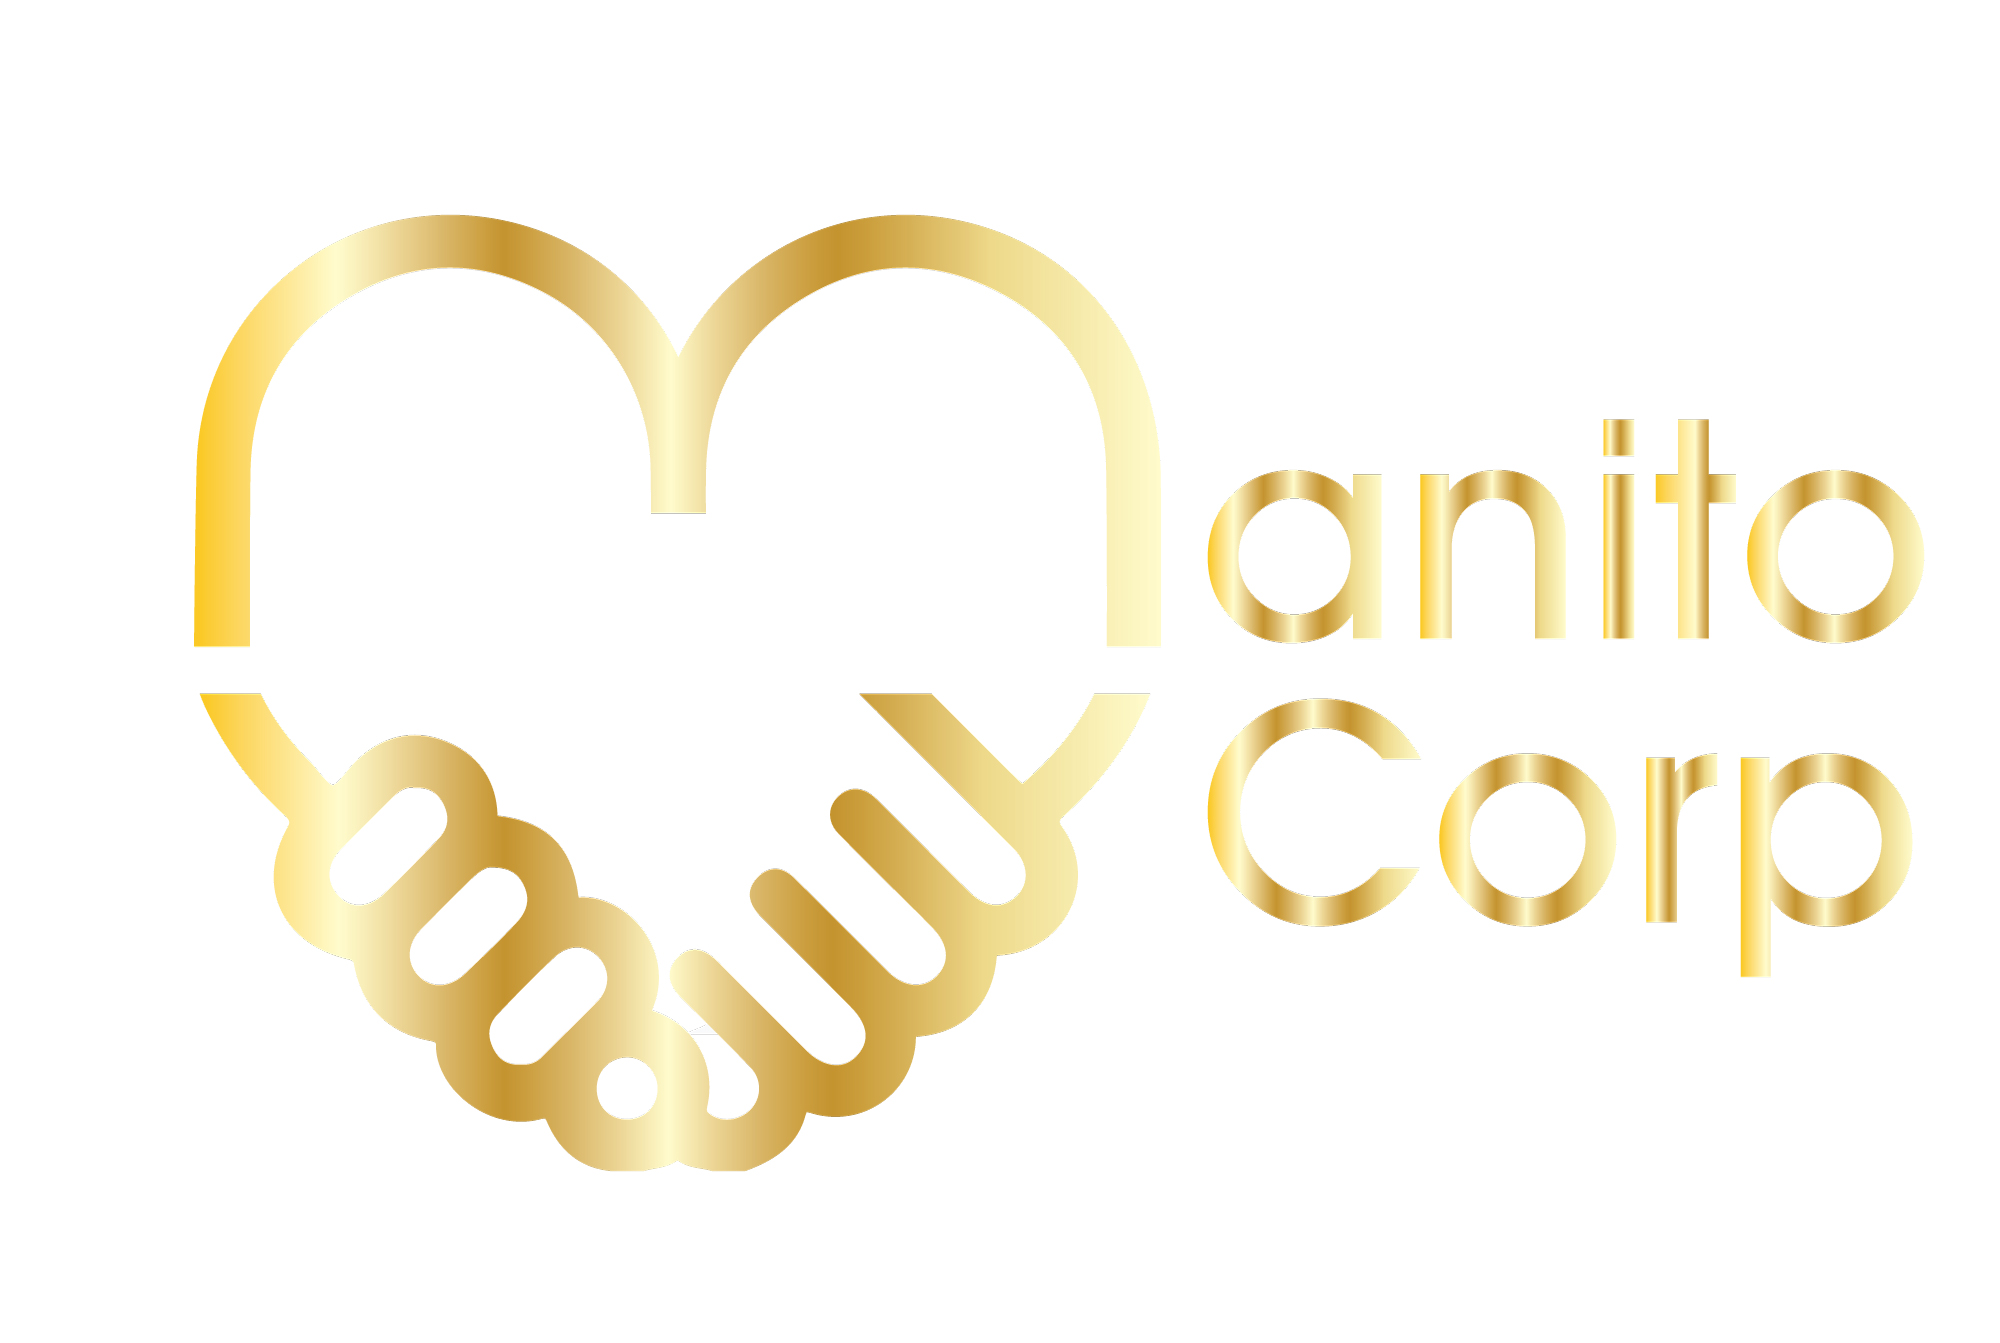 Manito-Corp-logo.jpg